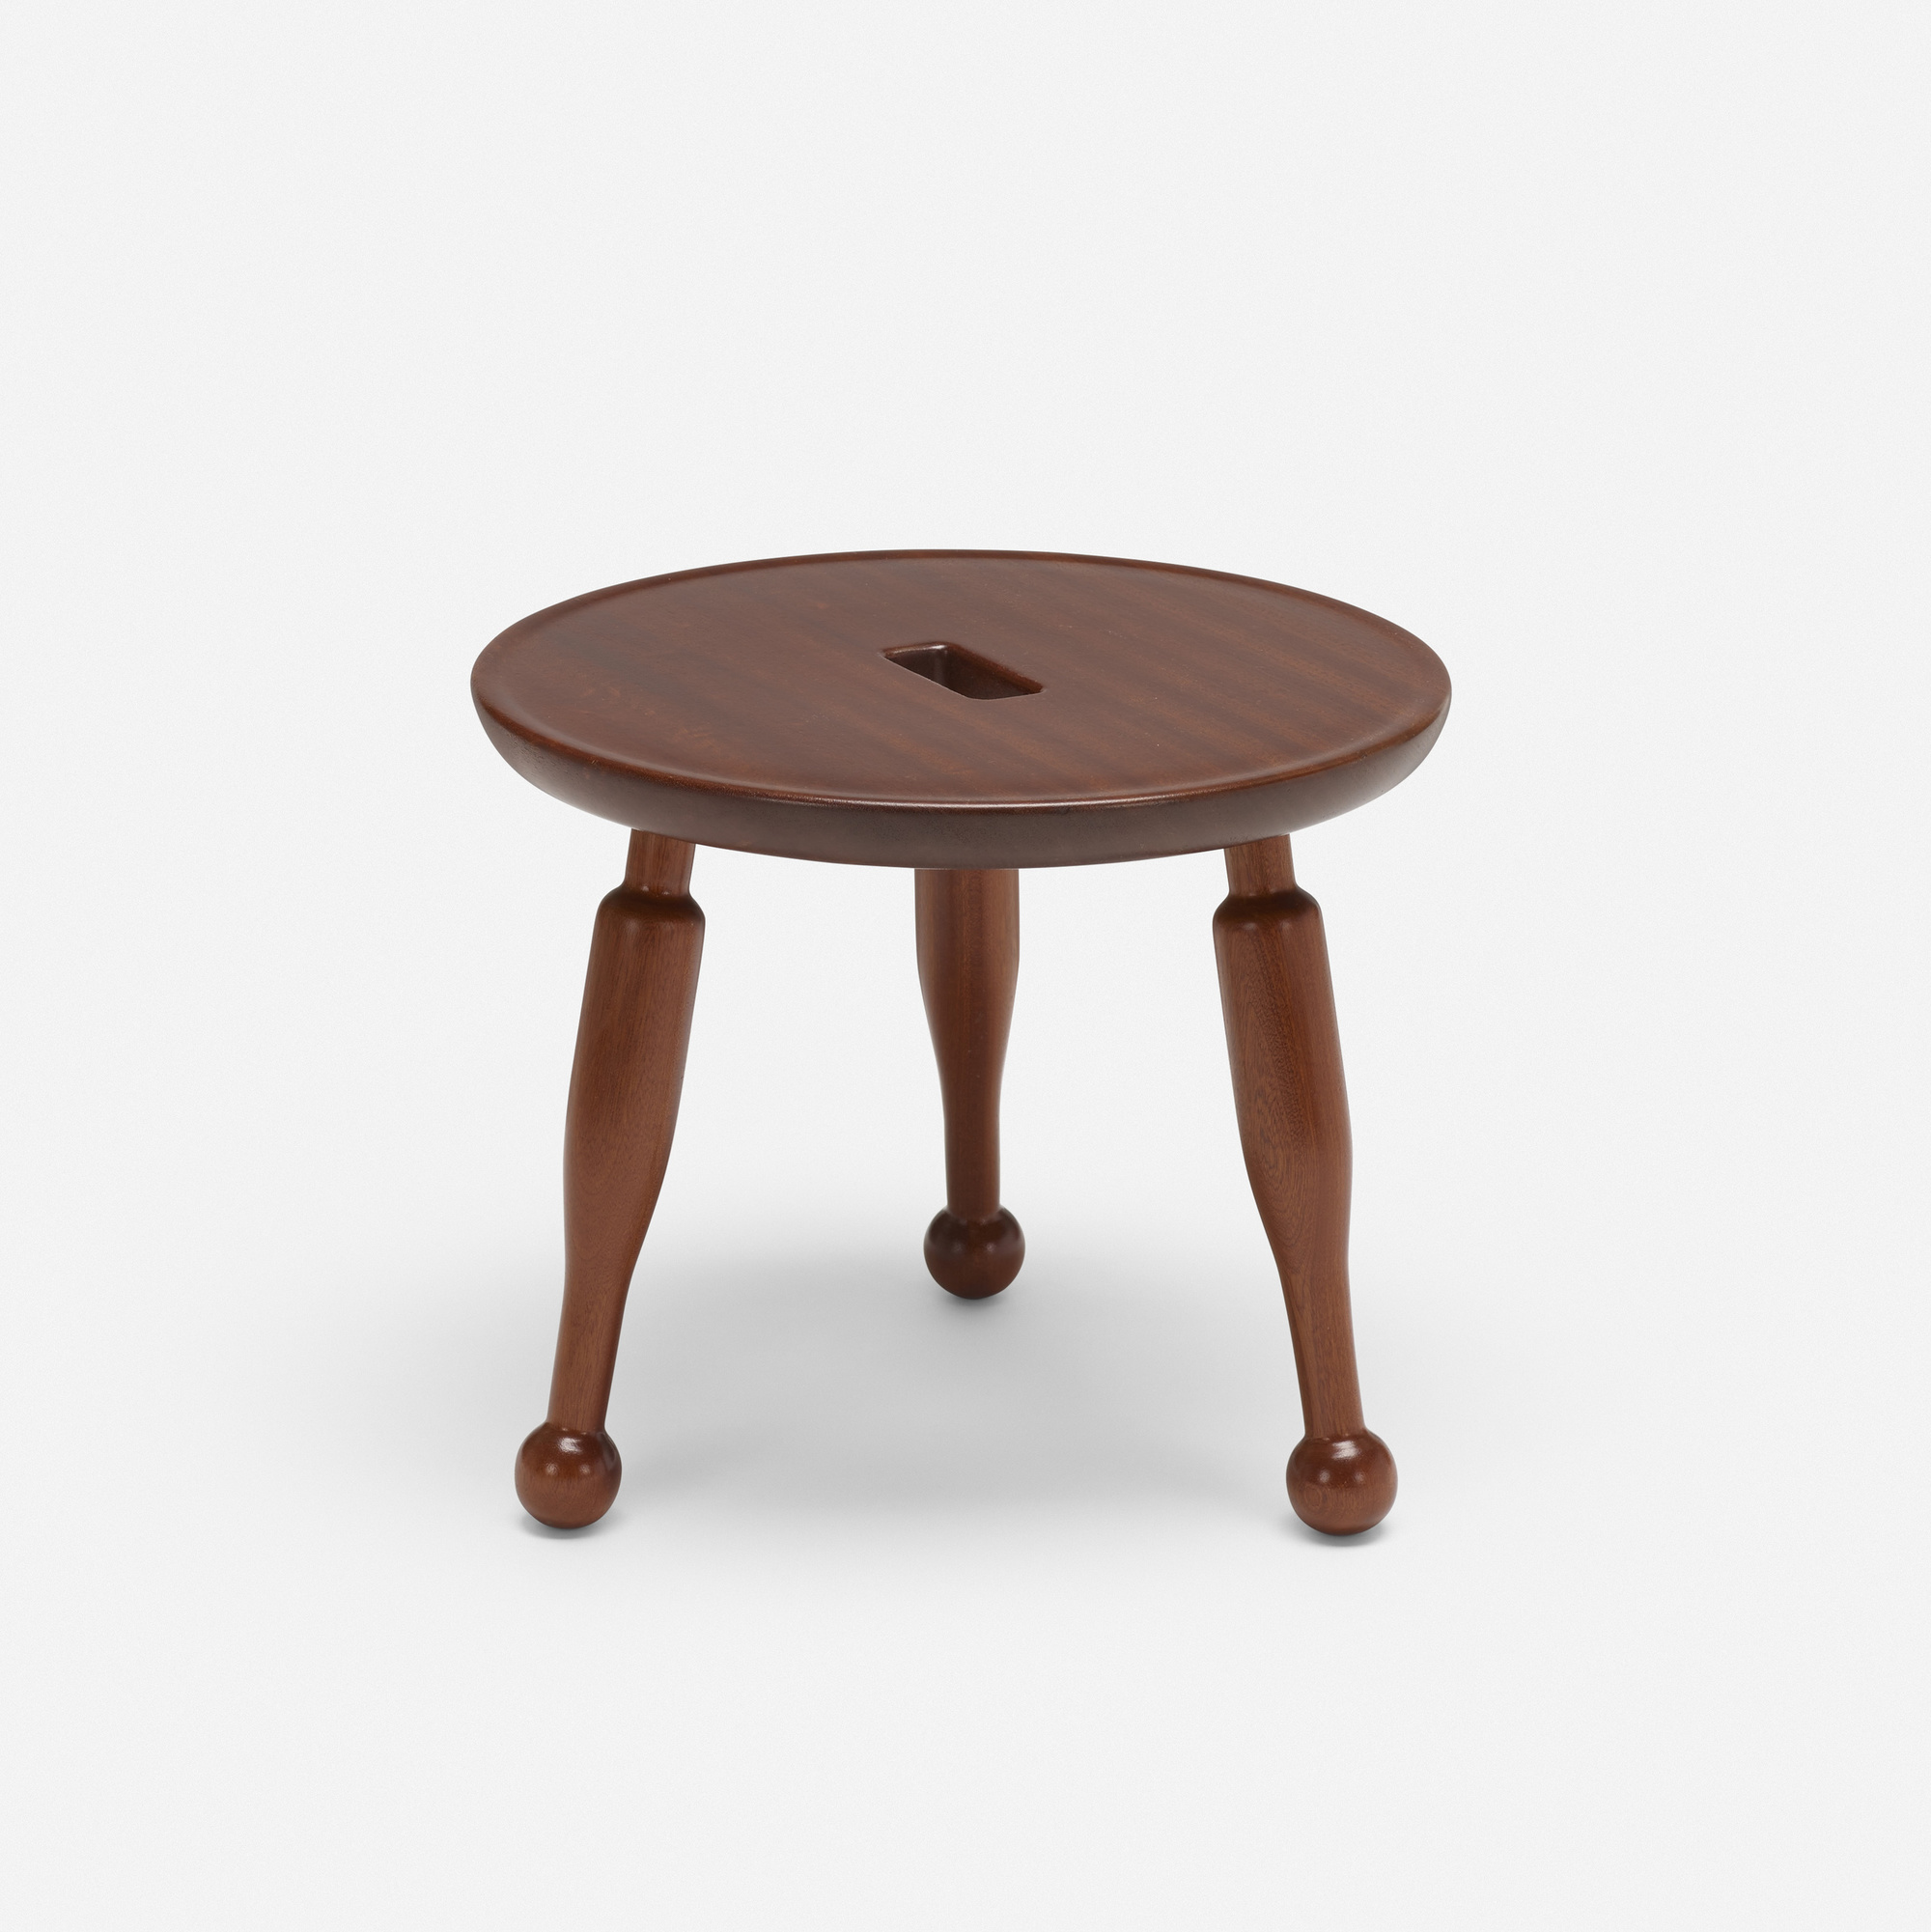 287: Josef Frank / stool, model 2156 (1 of 2)